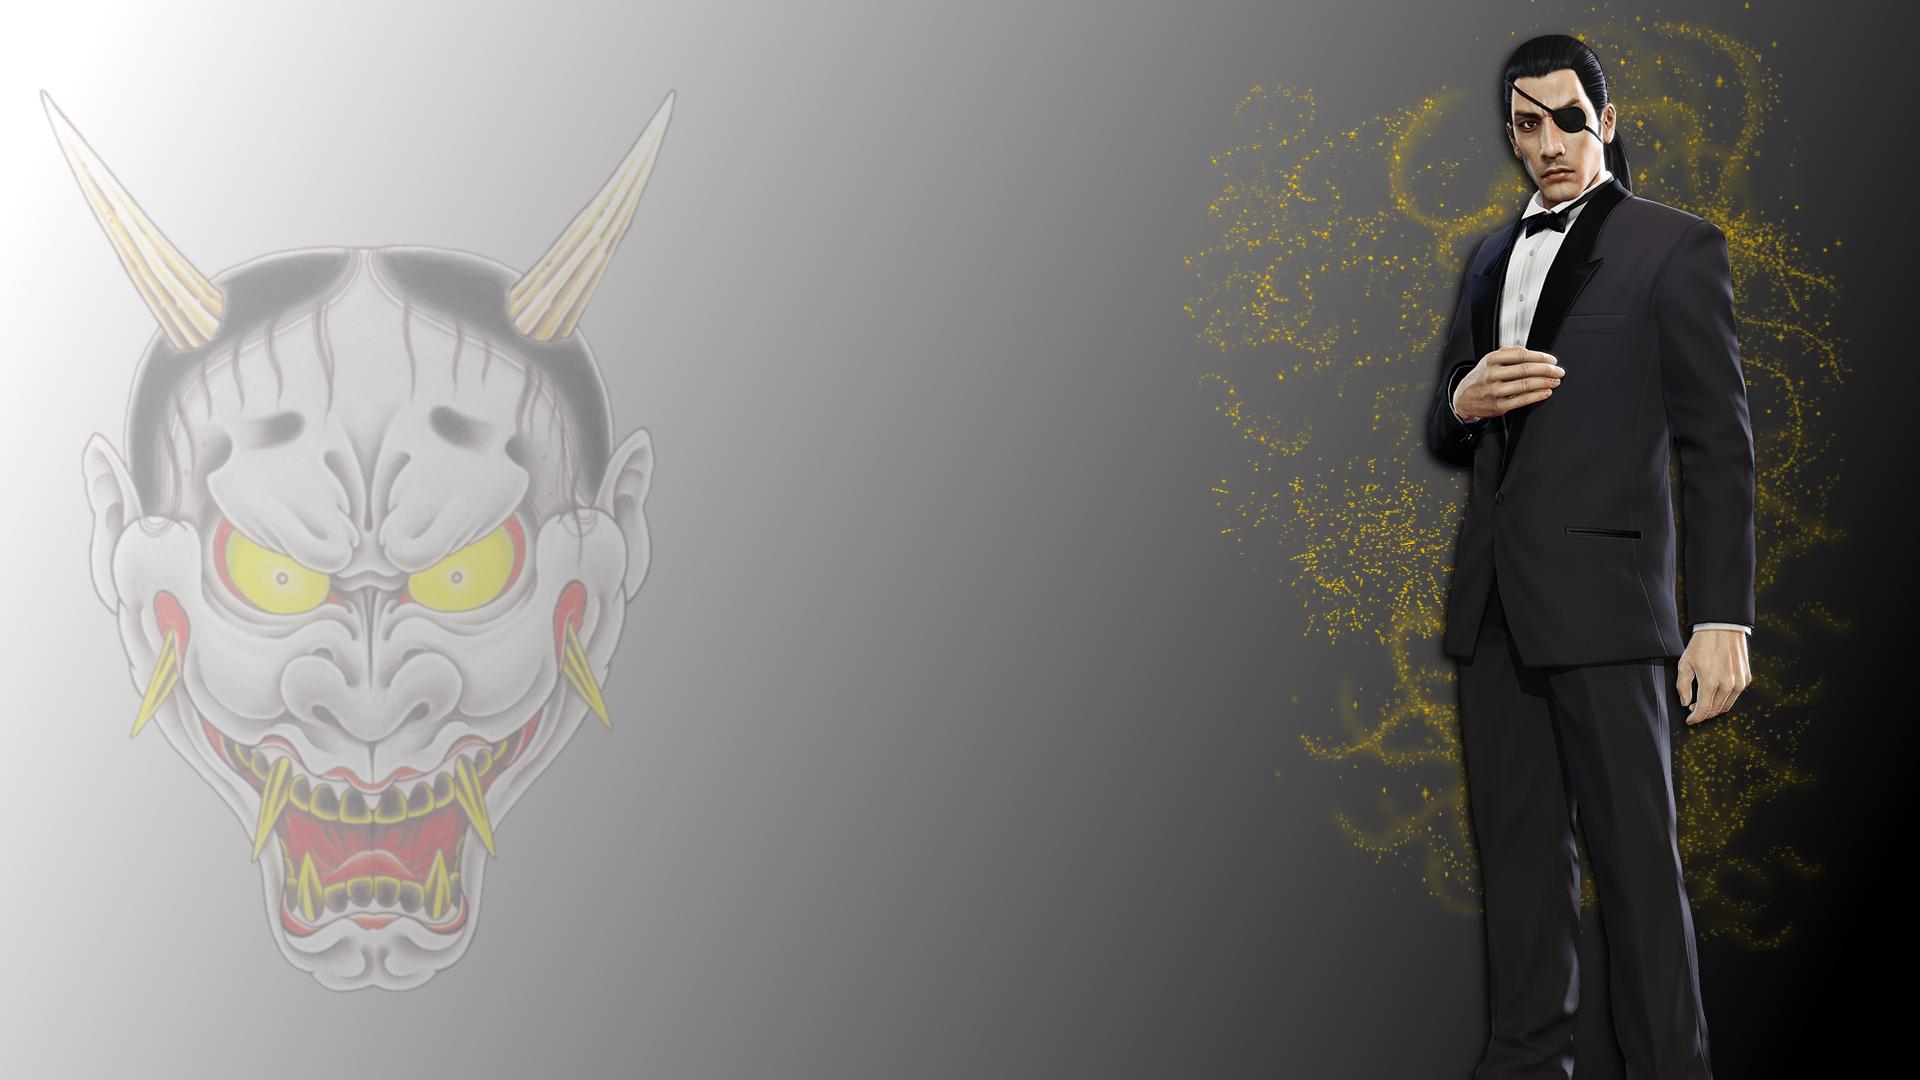 Yakuza 0 Majima Wallpaper By Drasticxx On Deviantart